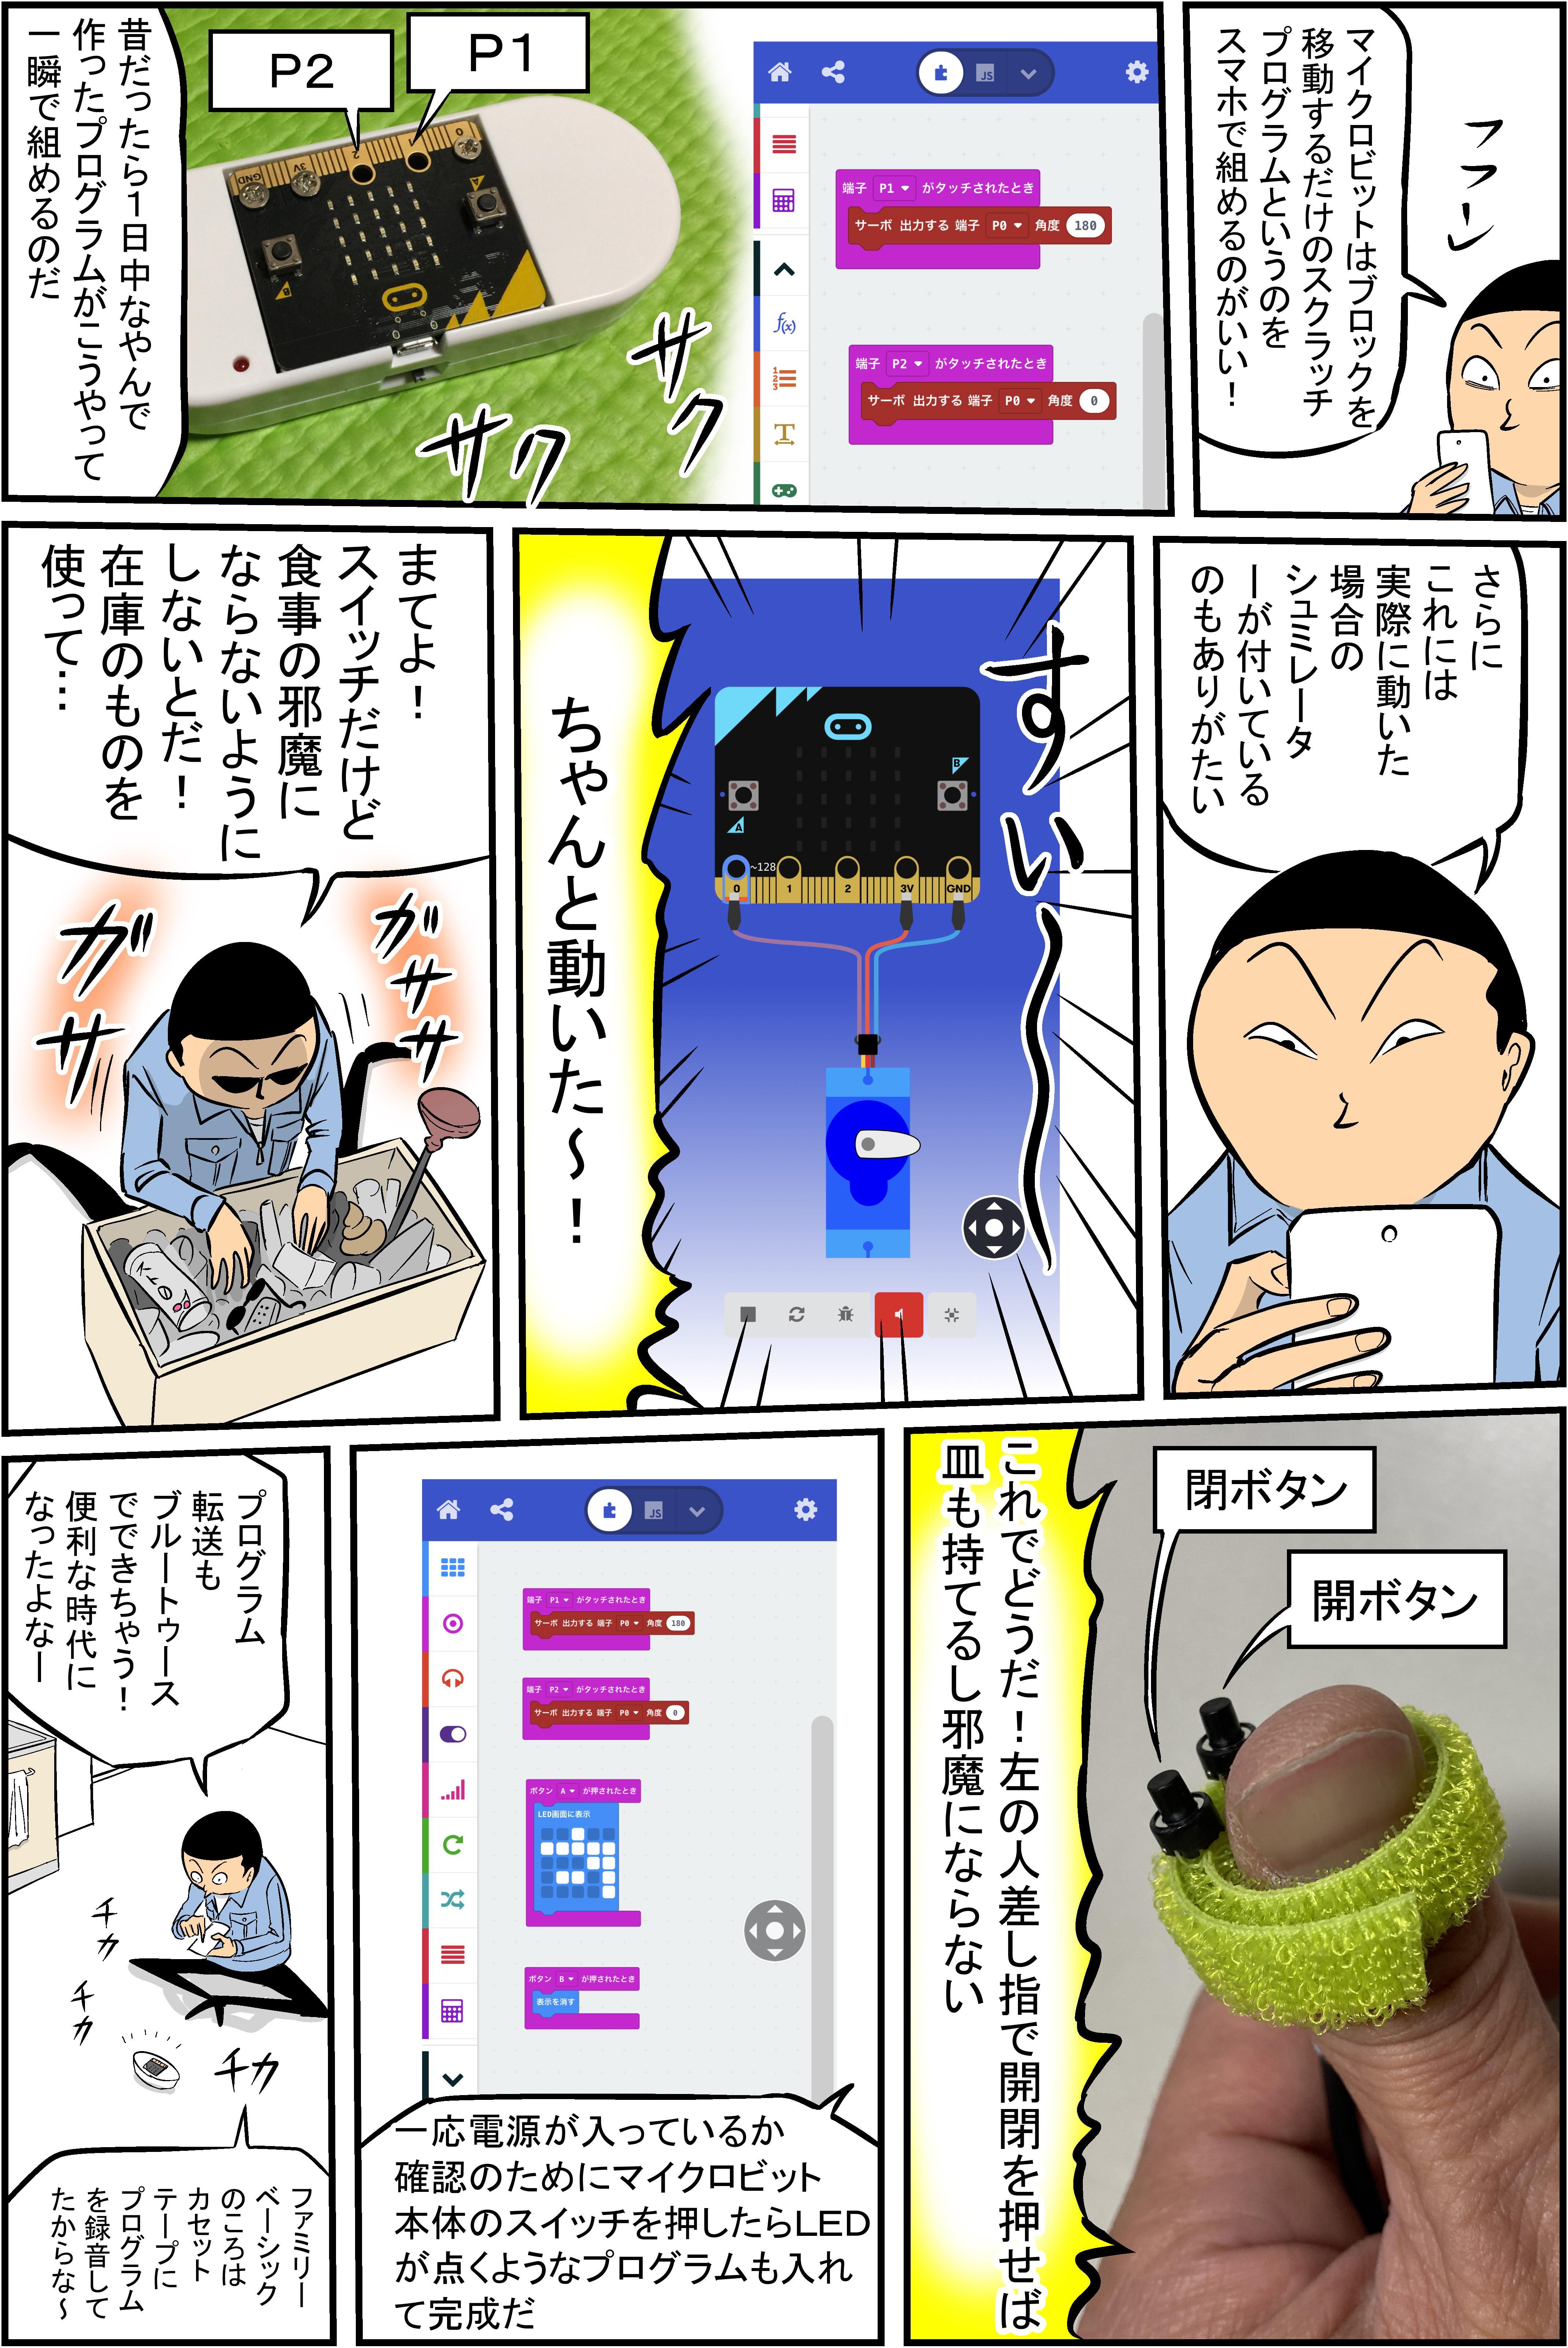 bsm_003-02-04.jpg